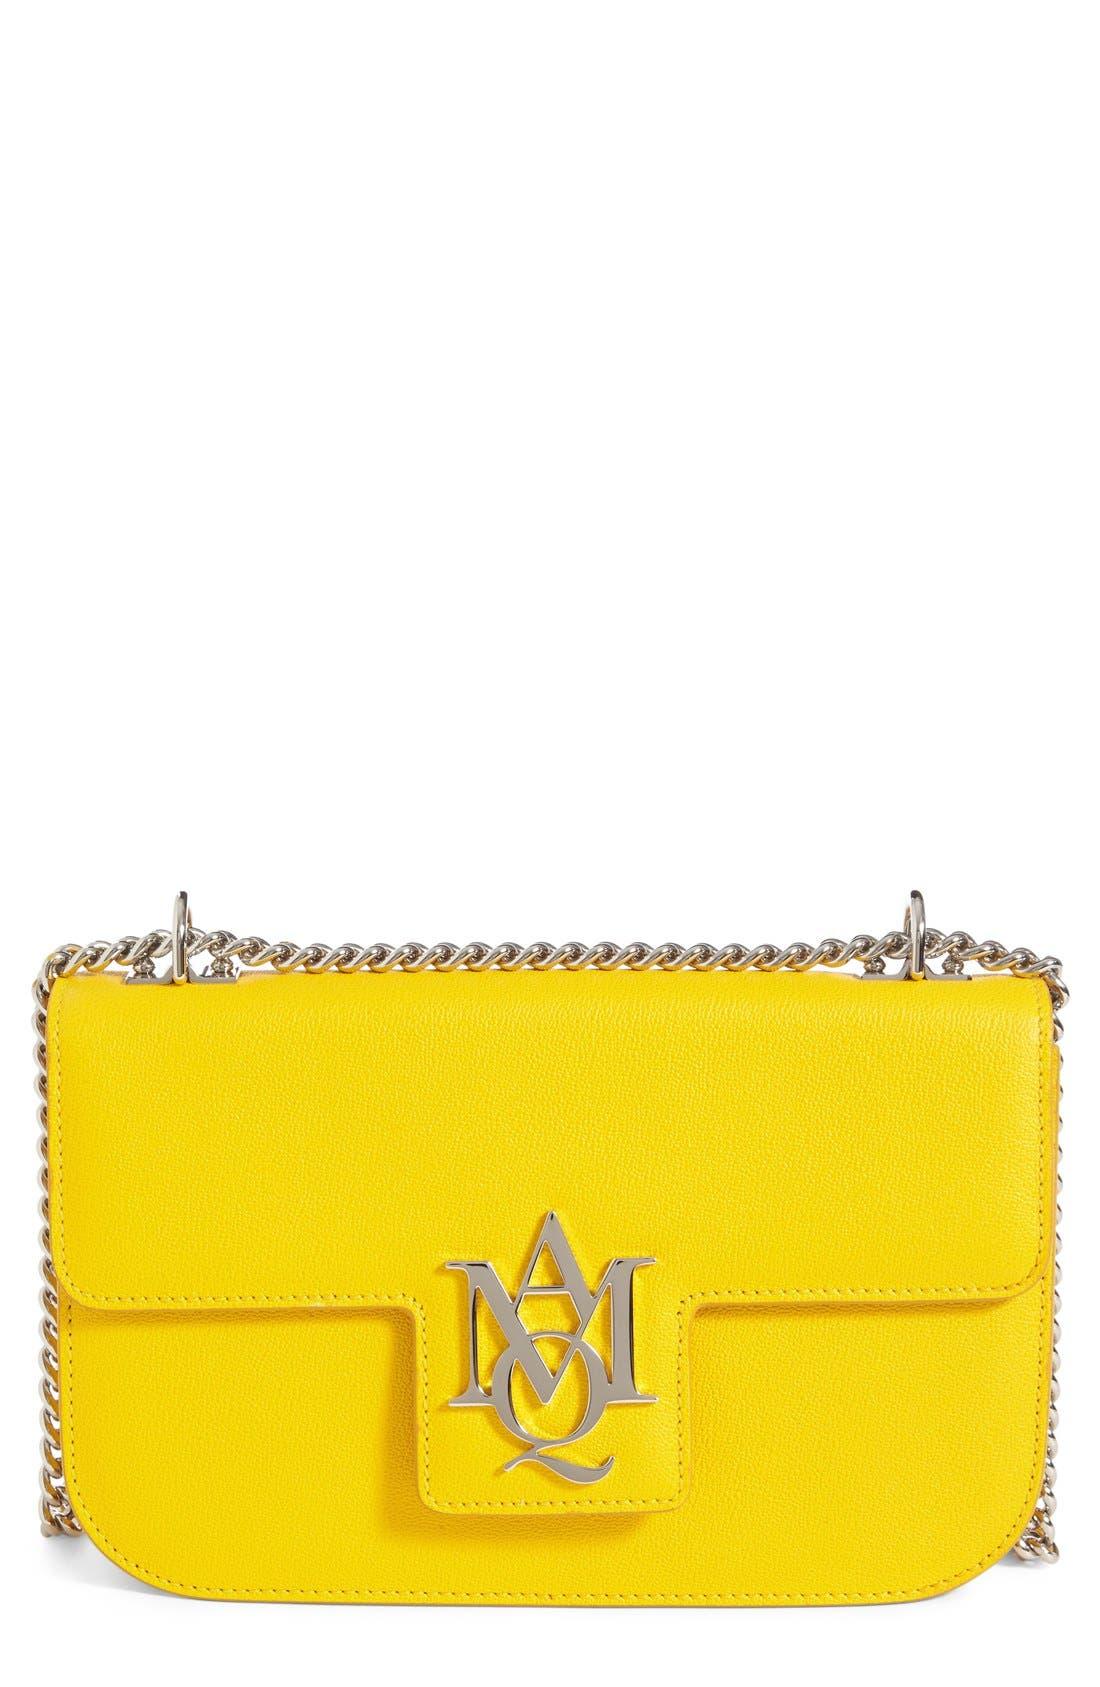 Alternate Image 1 Selected - Alexander McQueen 'Medium Insignia Chain' Calfskin Leather Satchel